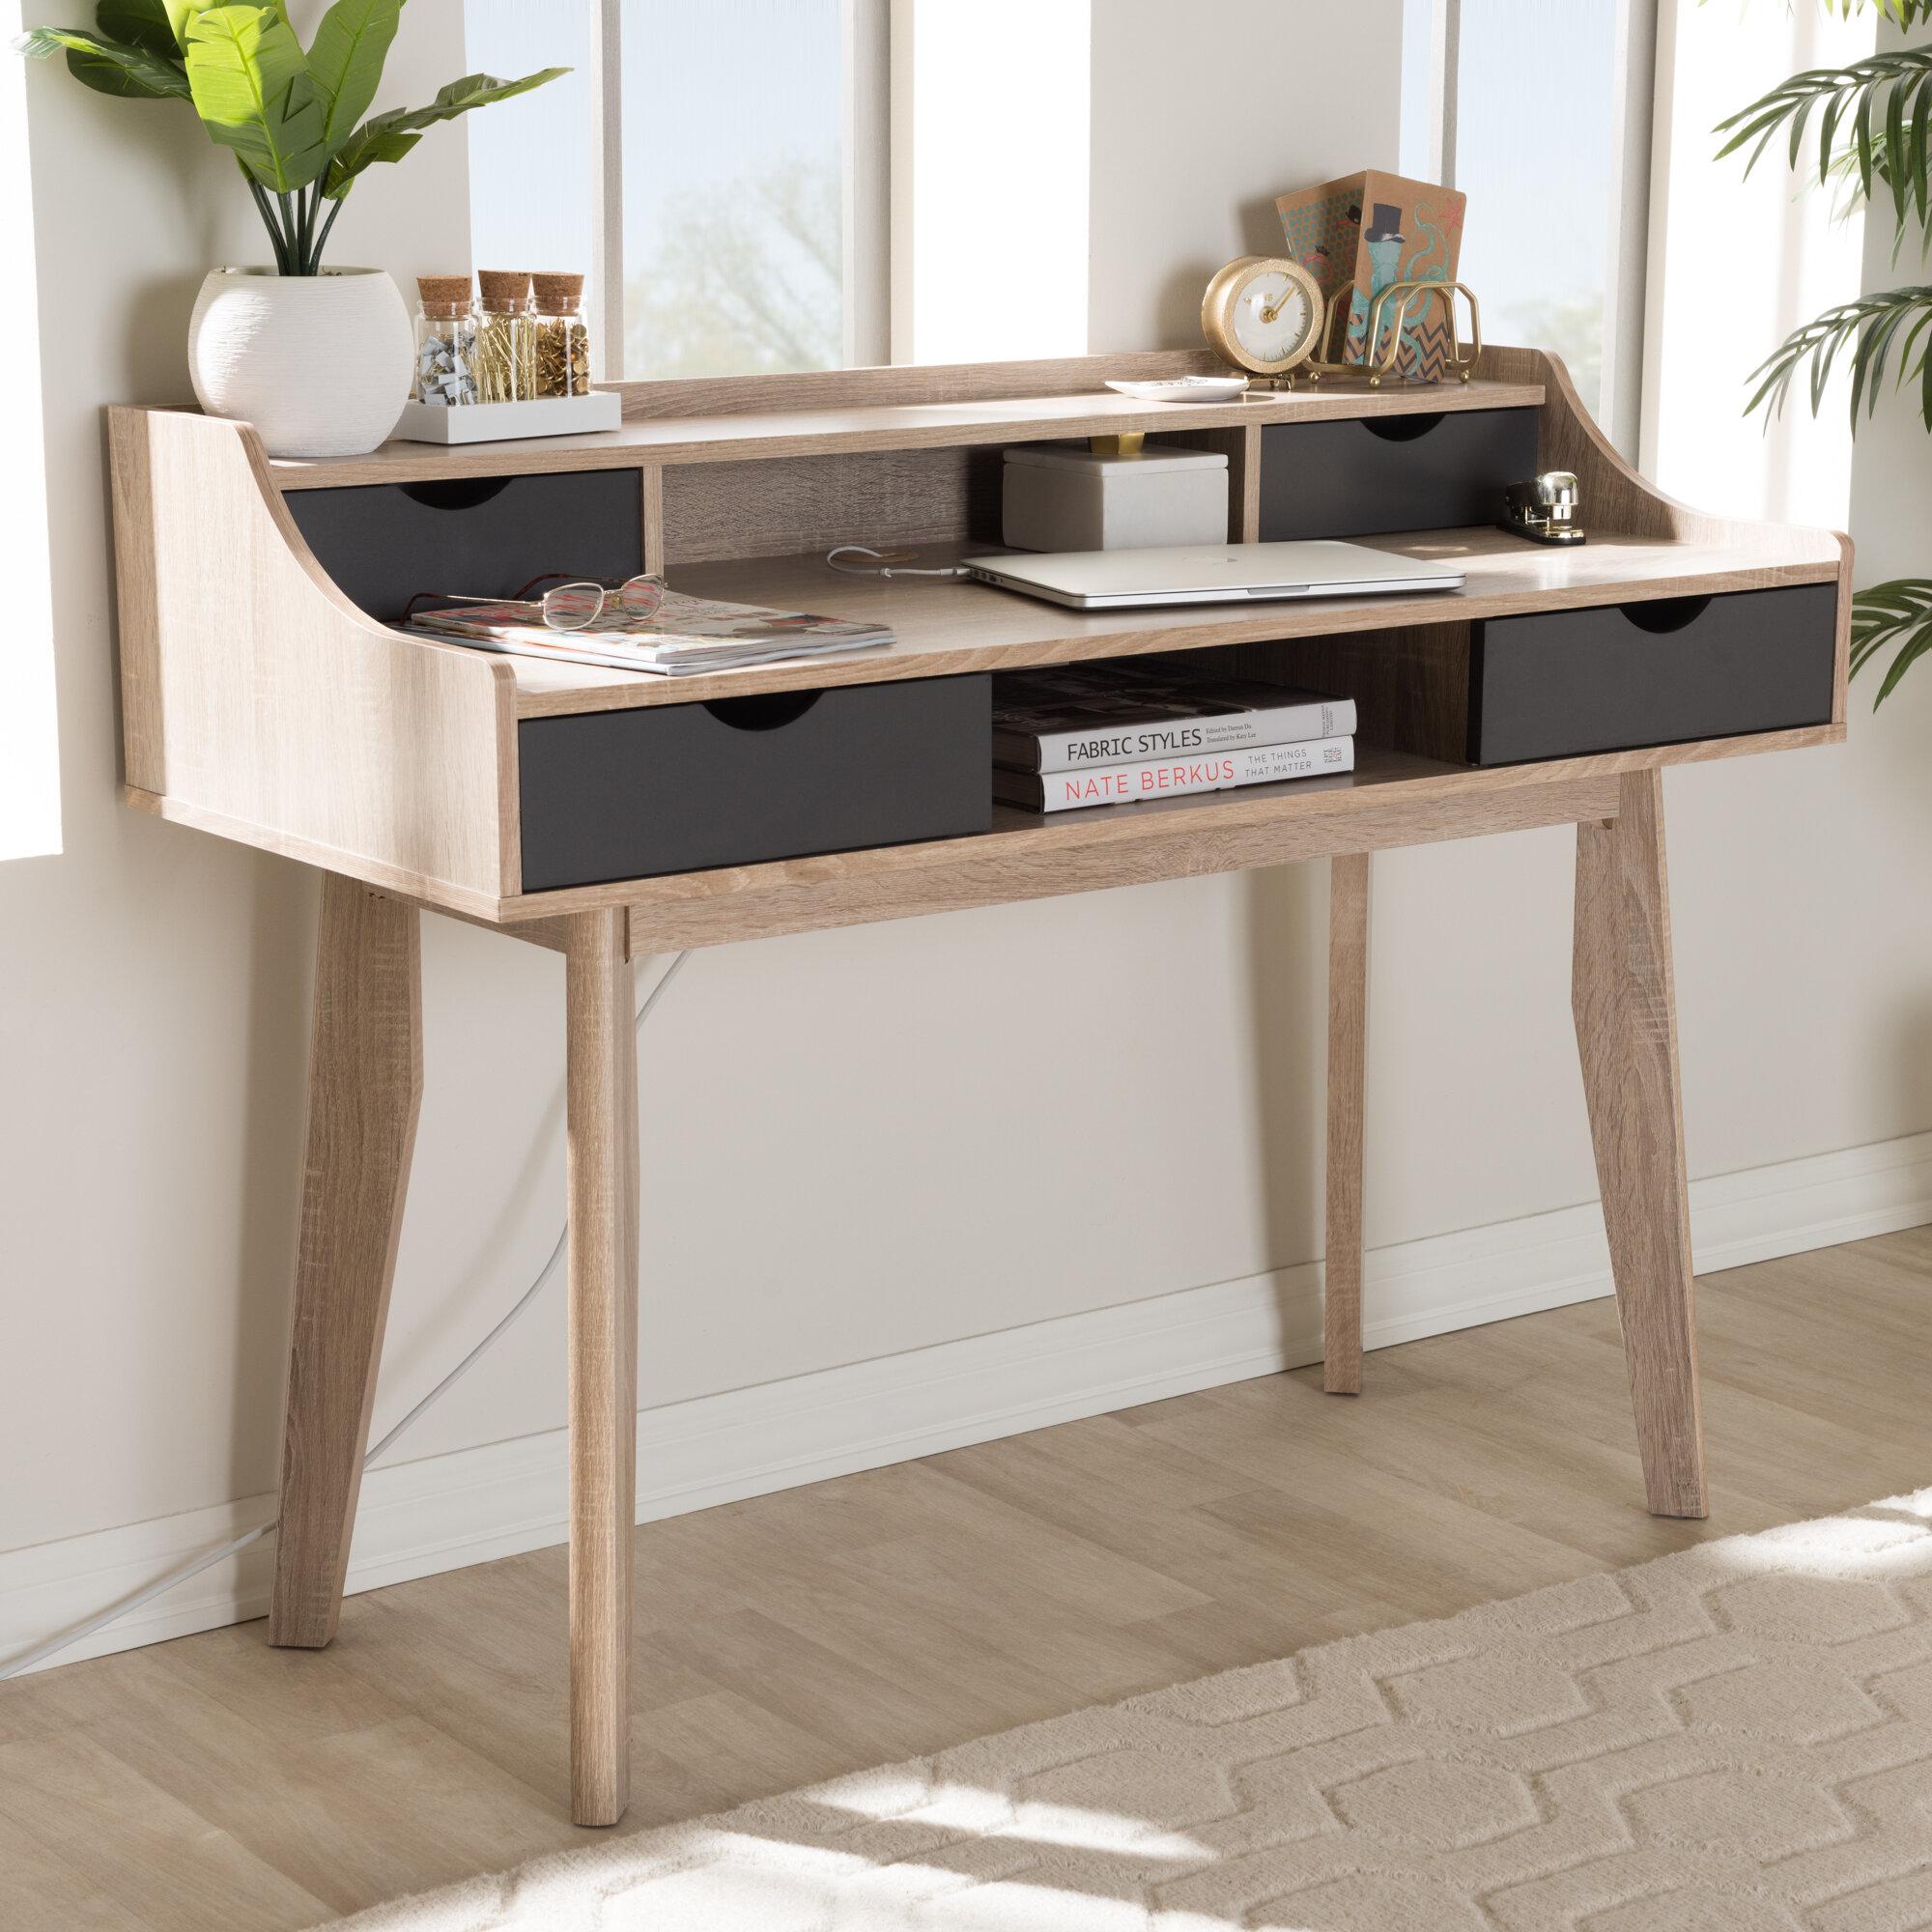 enlargeclick modern desk living black click writing como tarkhan to product enlarge simple fdceffbd pk